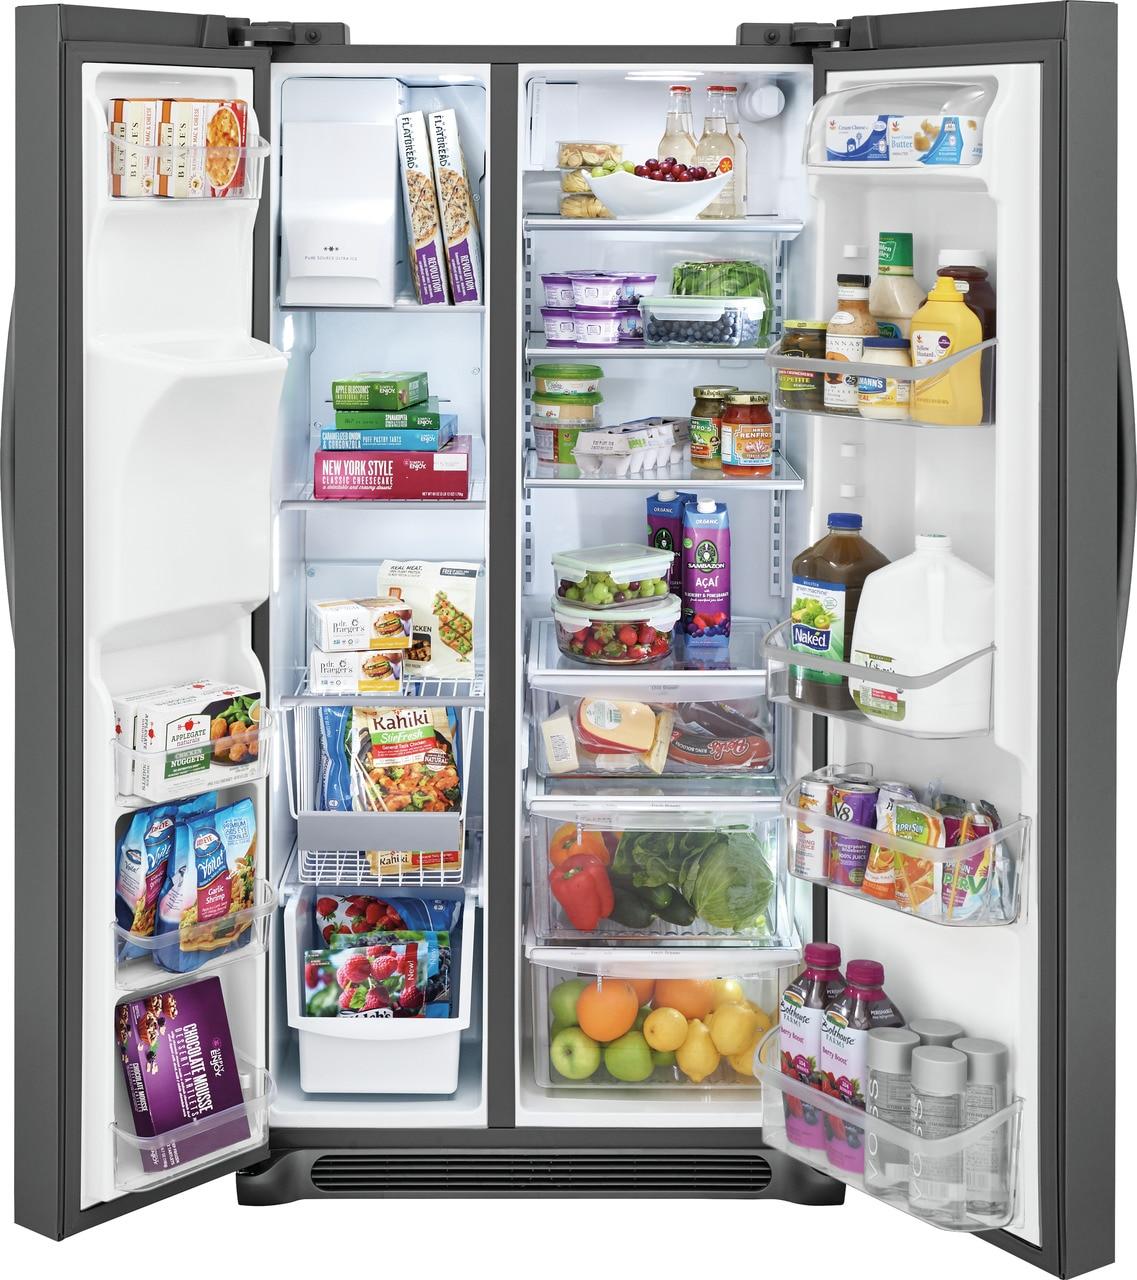 Model: FGSS2635TD   Frigidaire Gallery 25.5 Cu. Ft. Side-by-Side Refrigerator